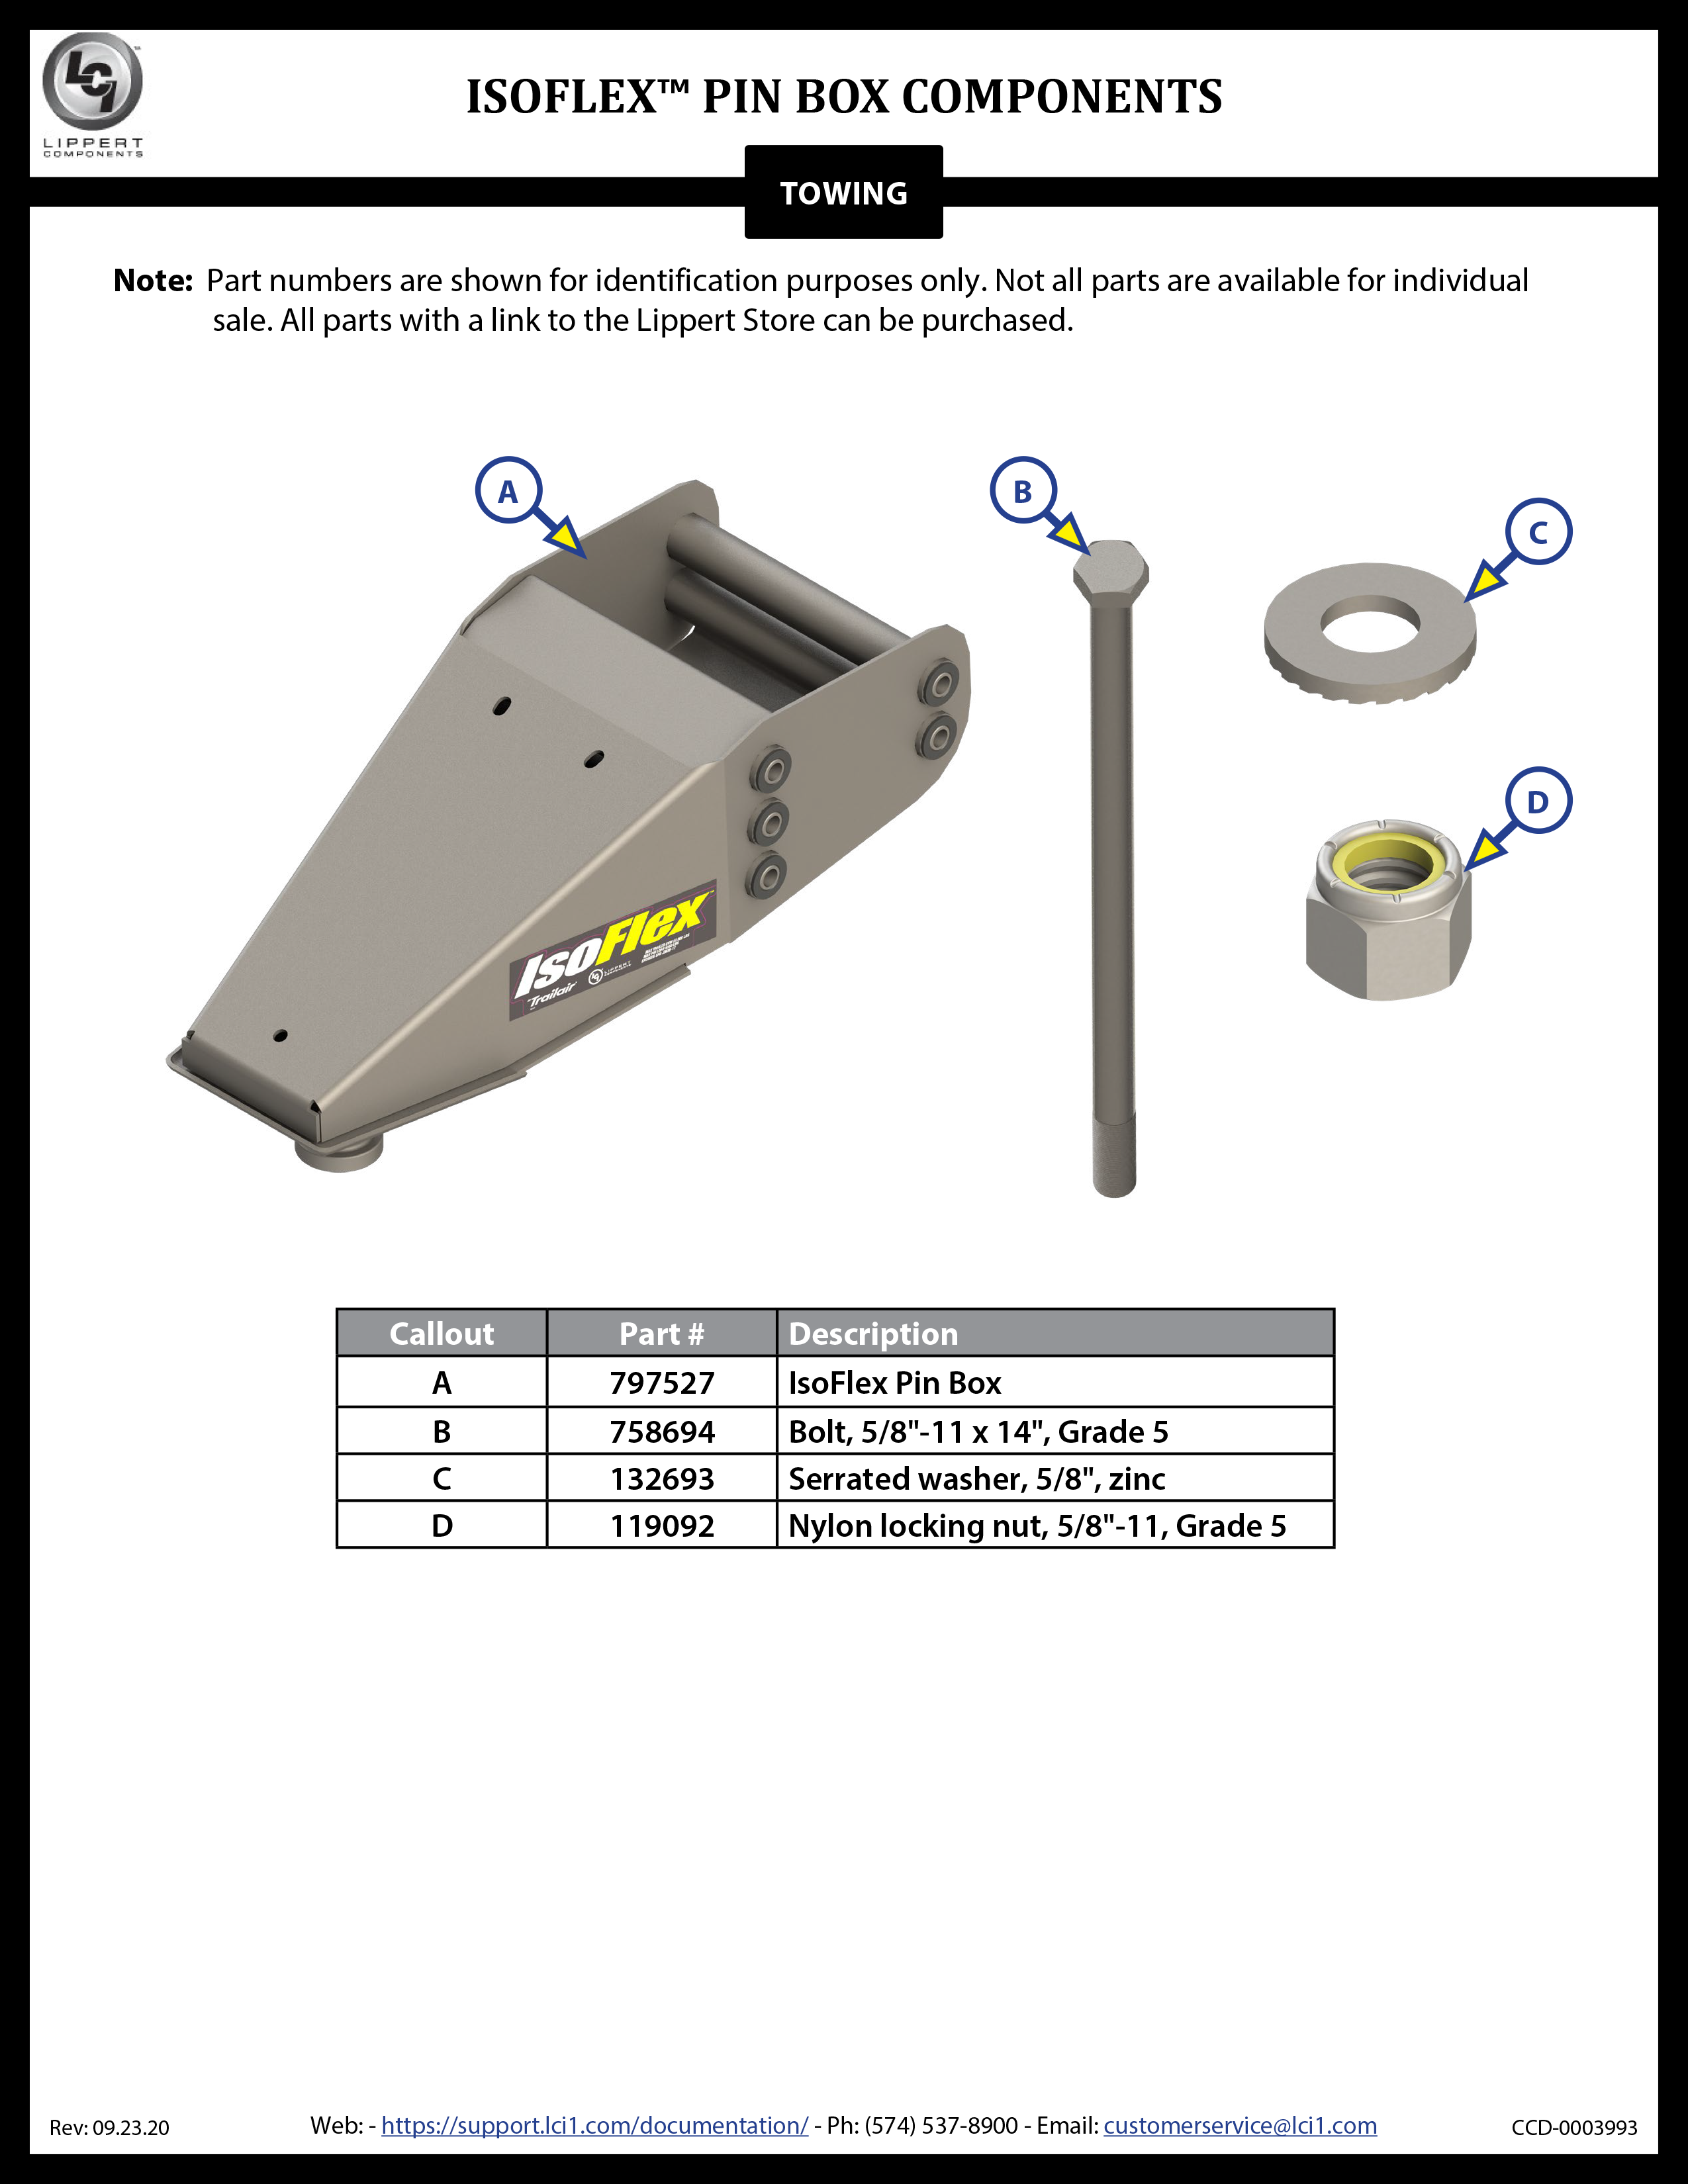 IsoFlex™ Pin Box Components